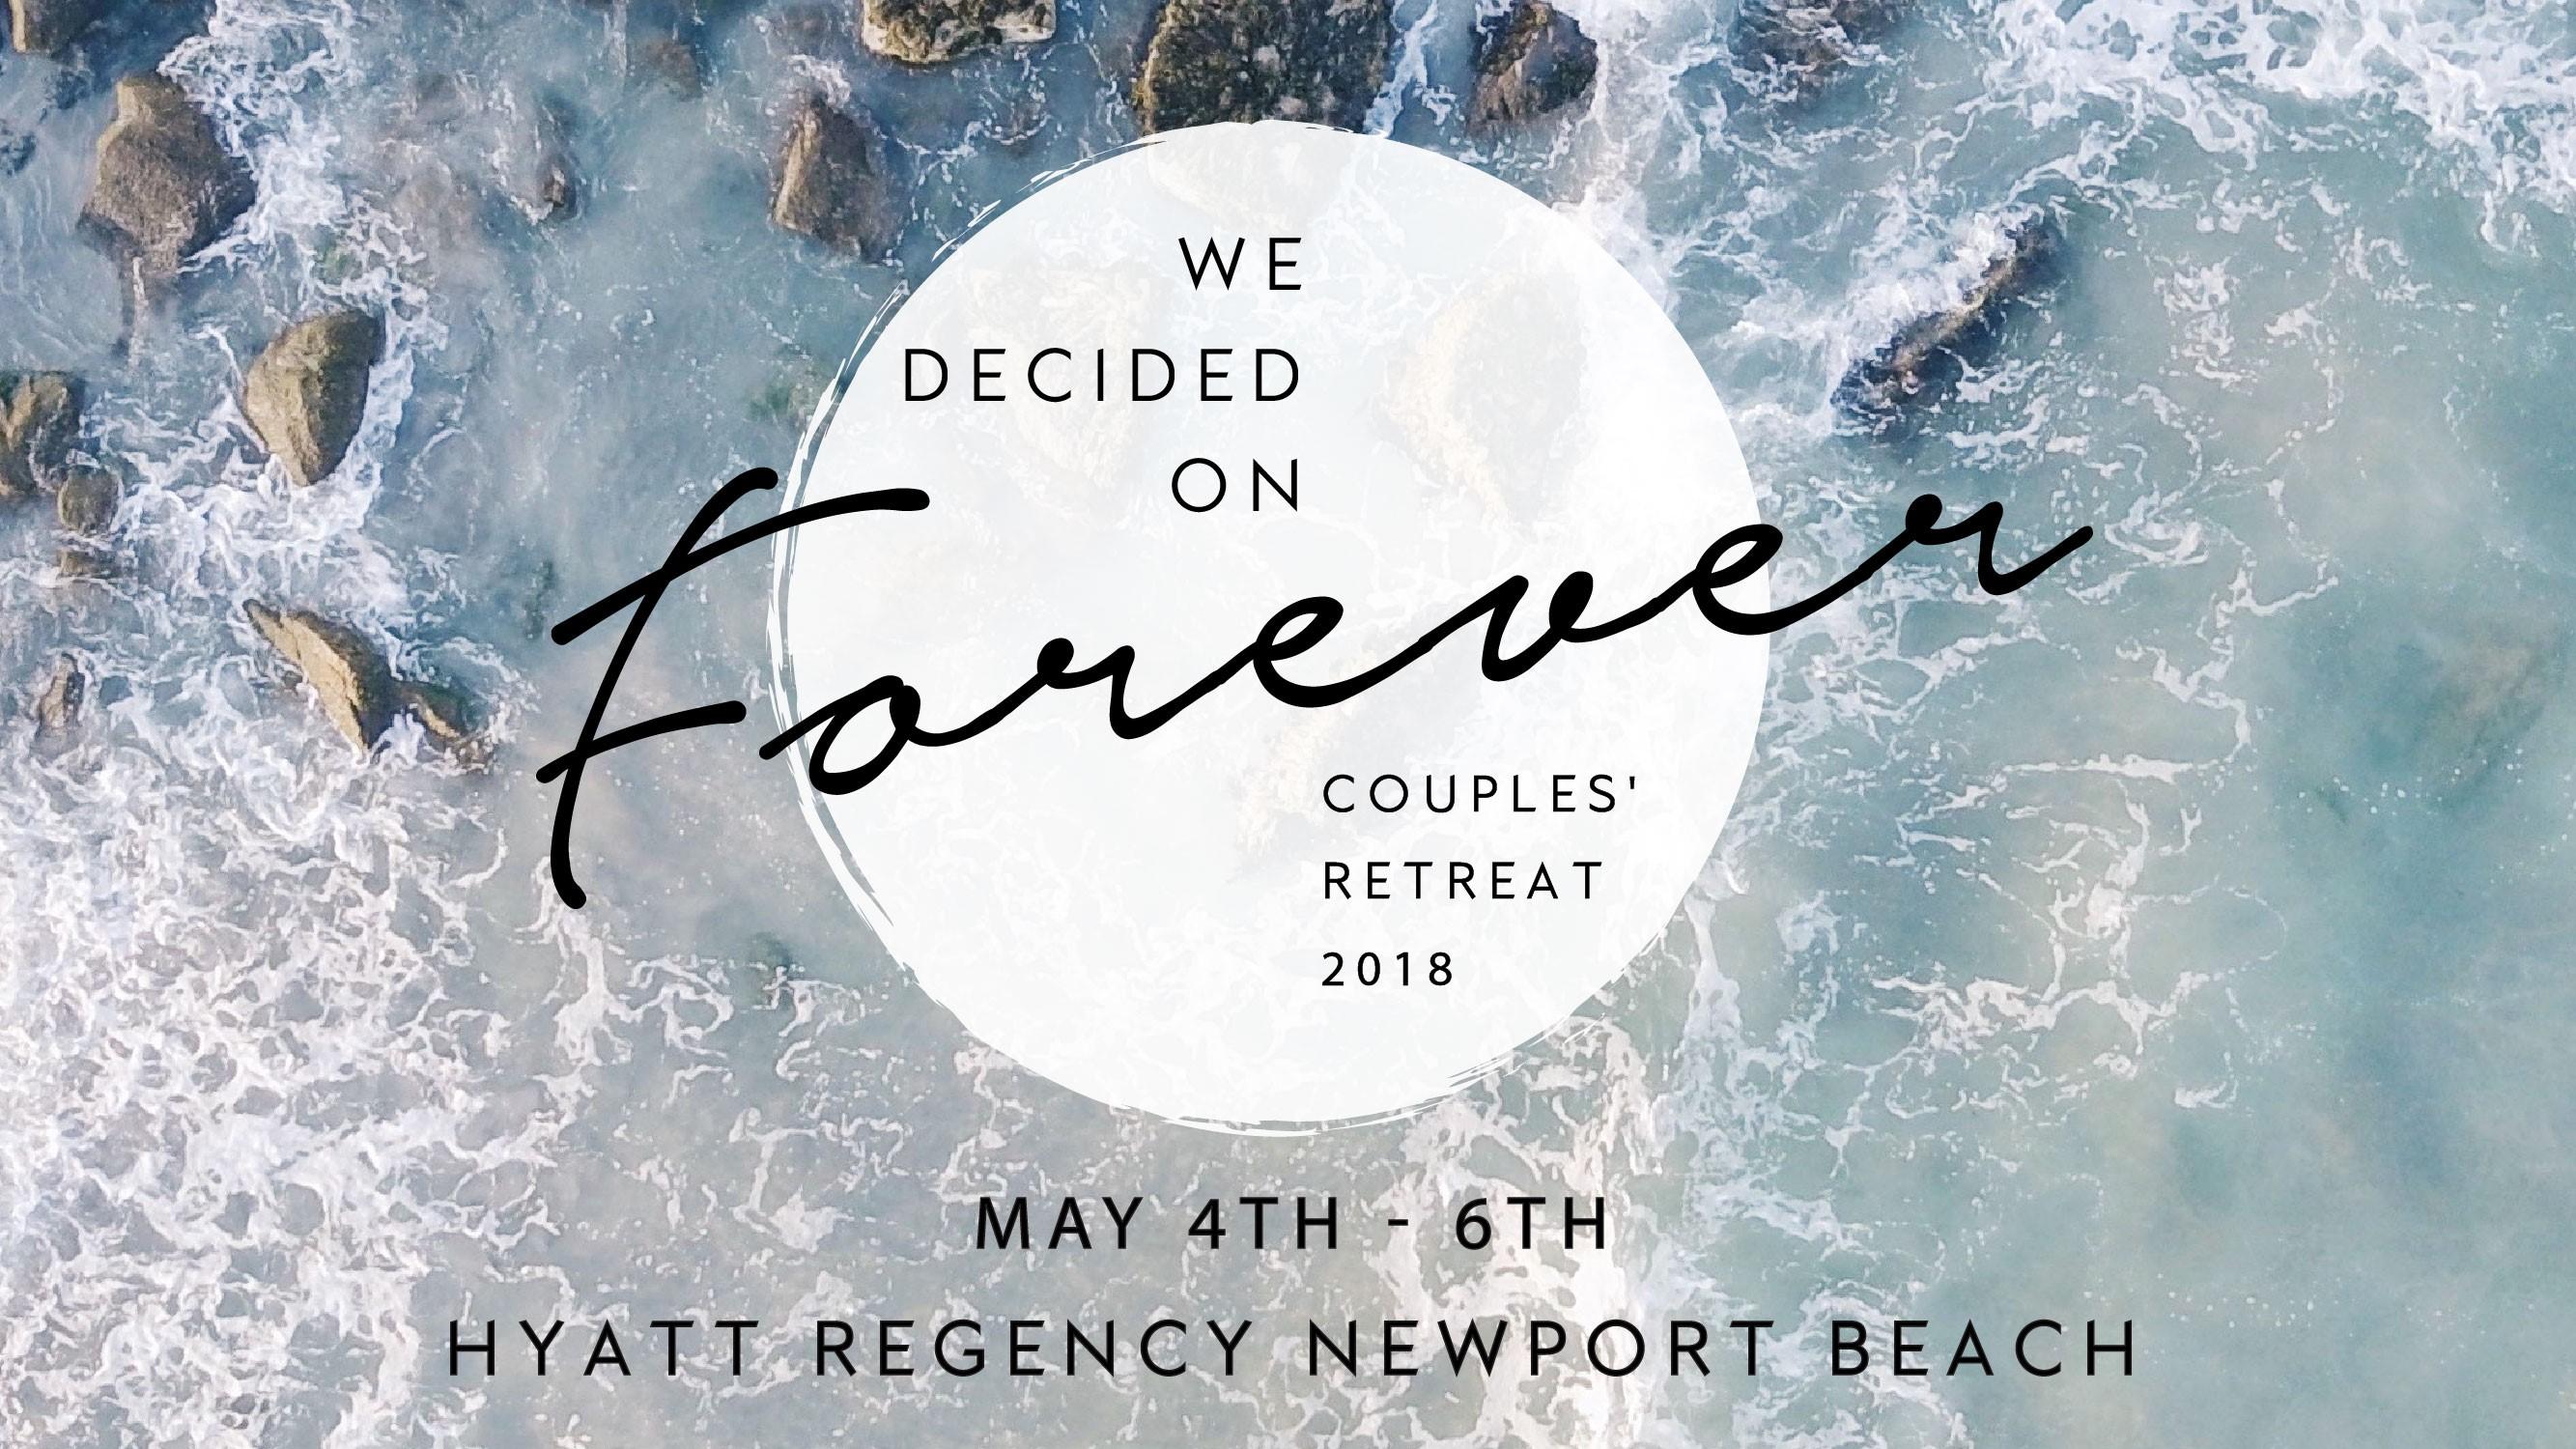 Couples  retreat graphic revised   no price